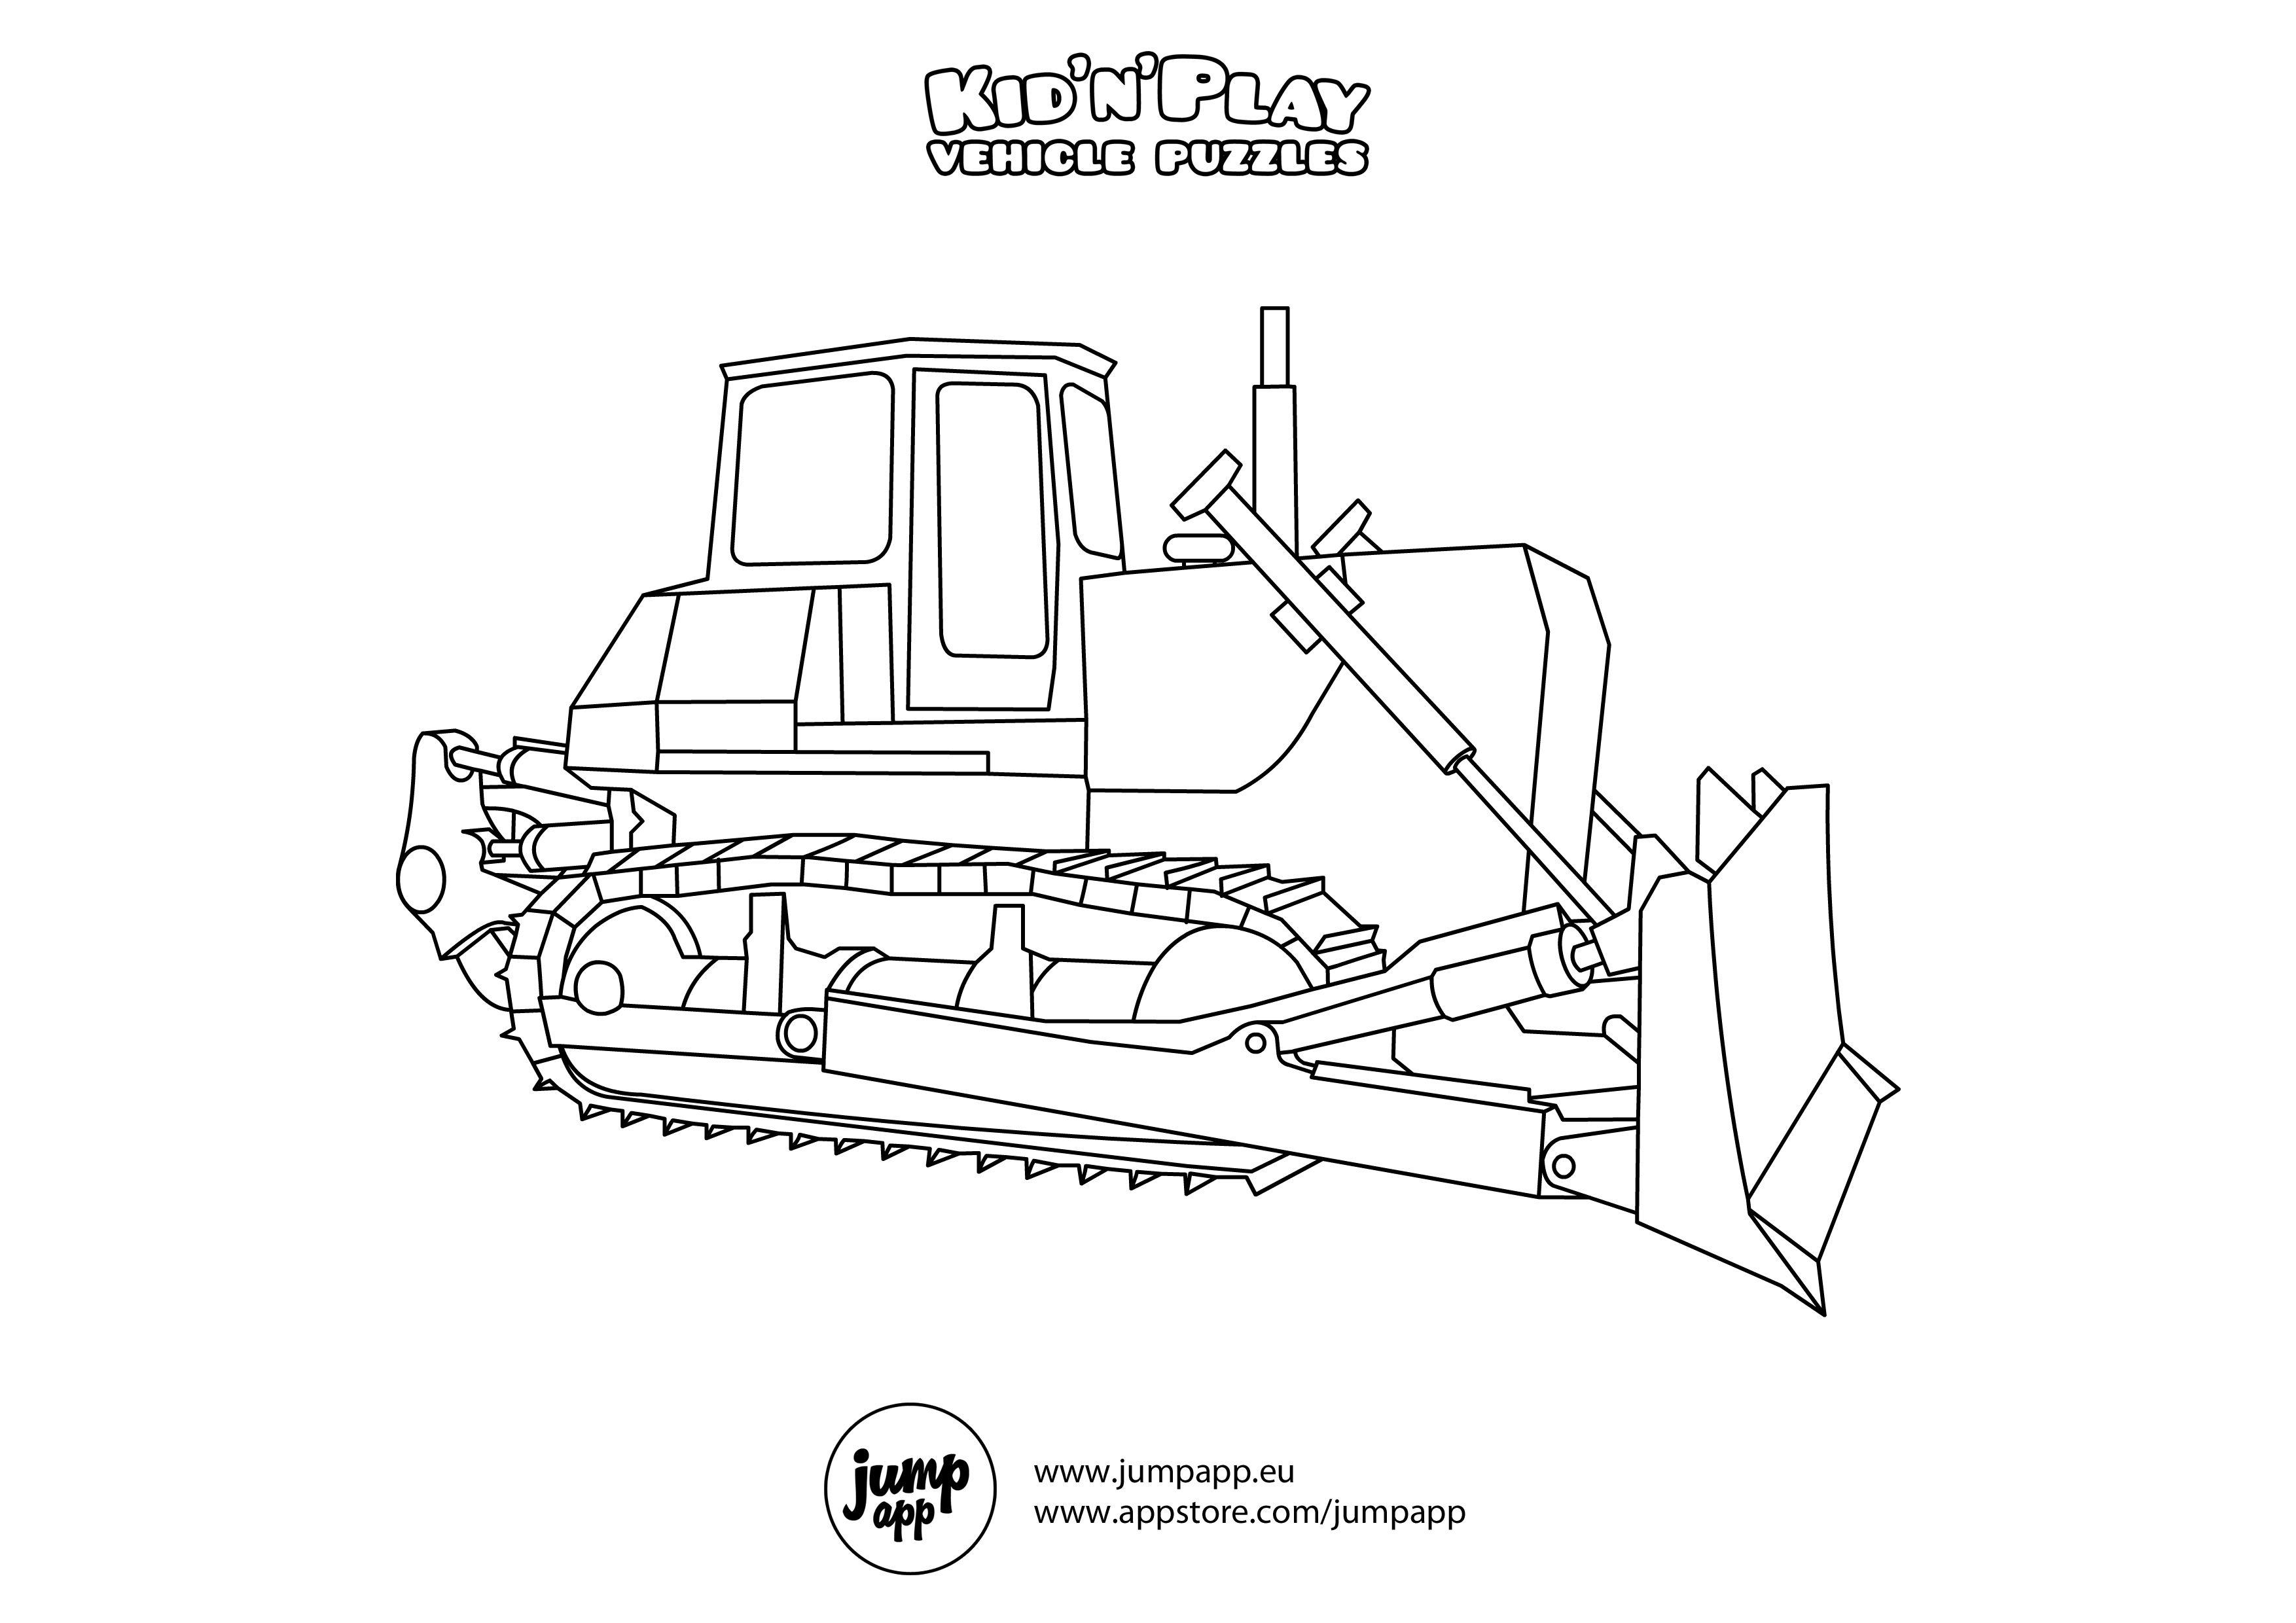 bulldozer coloring pages | Bulldozer Coloring Pages